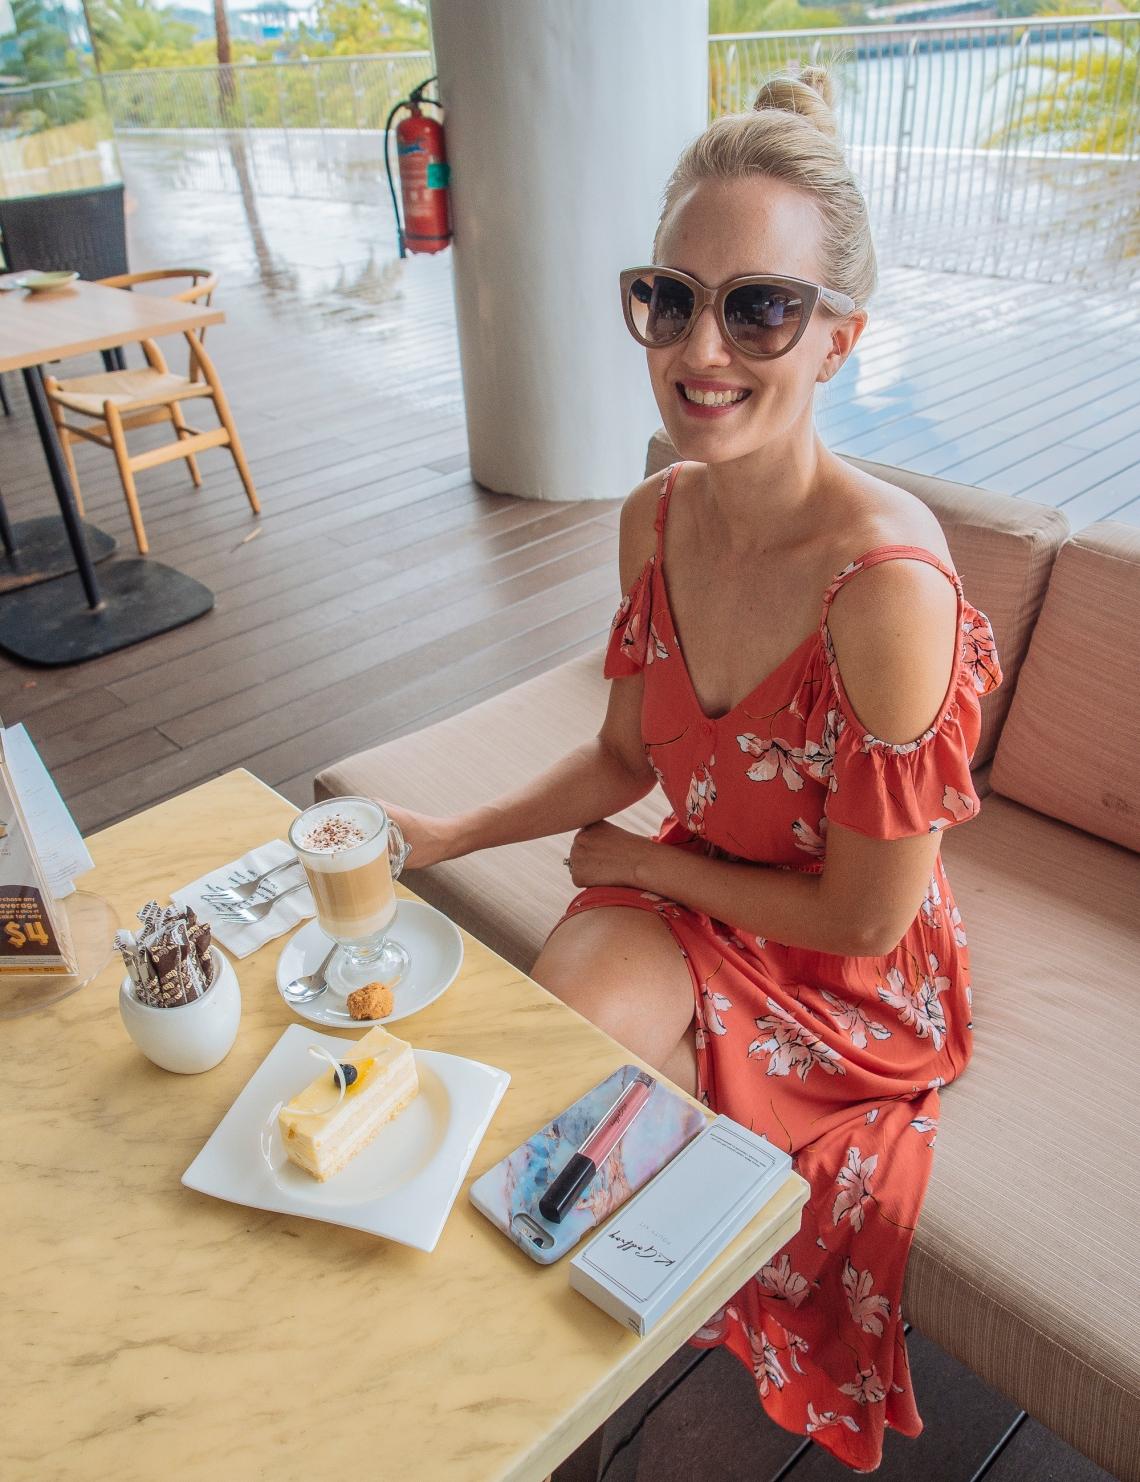 cafe tcc vivo city blogger findianlife